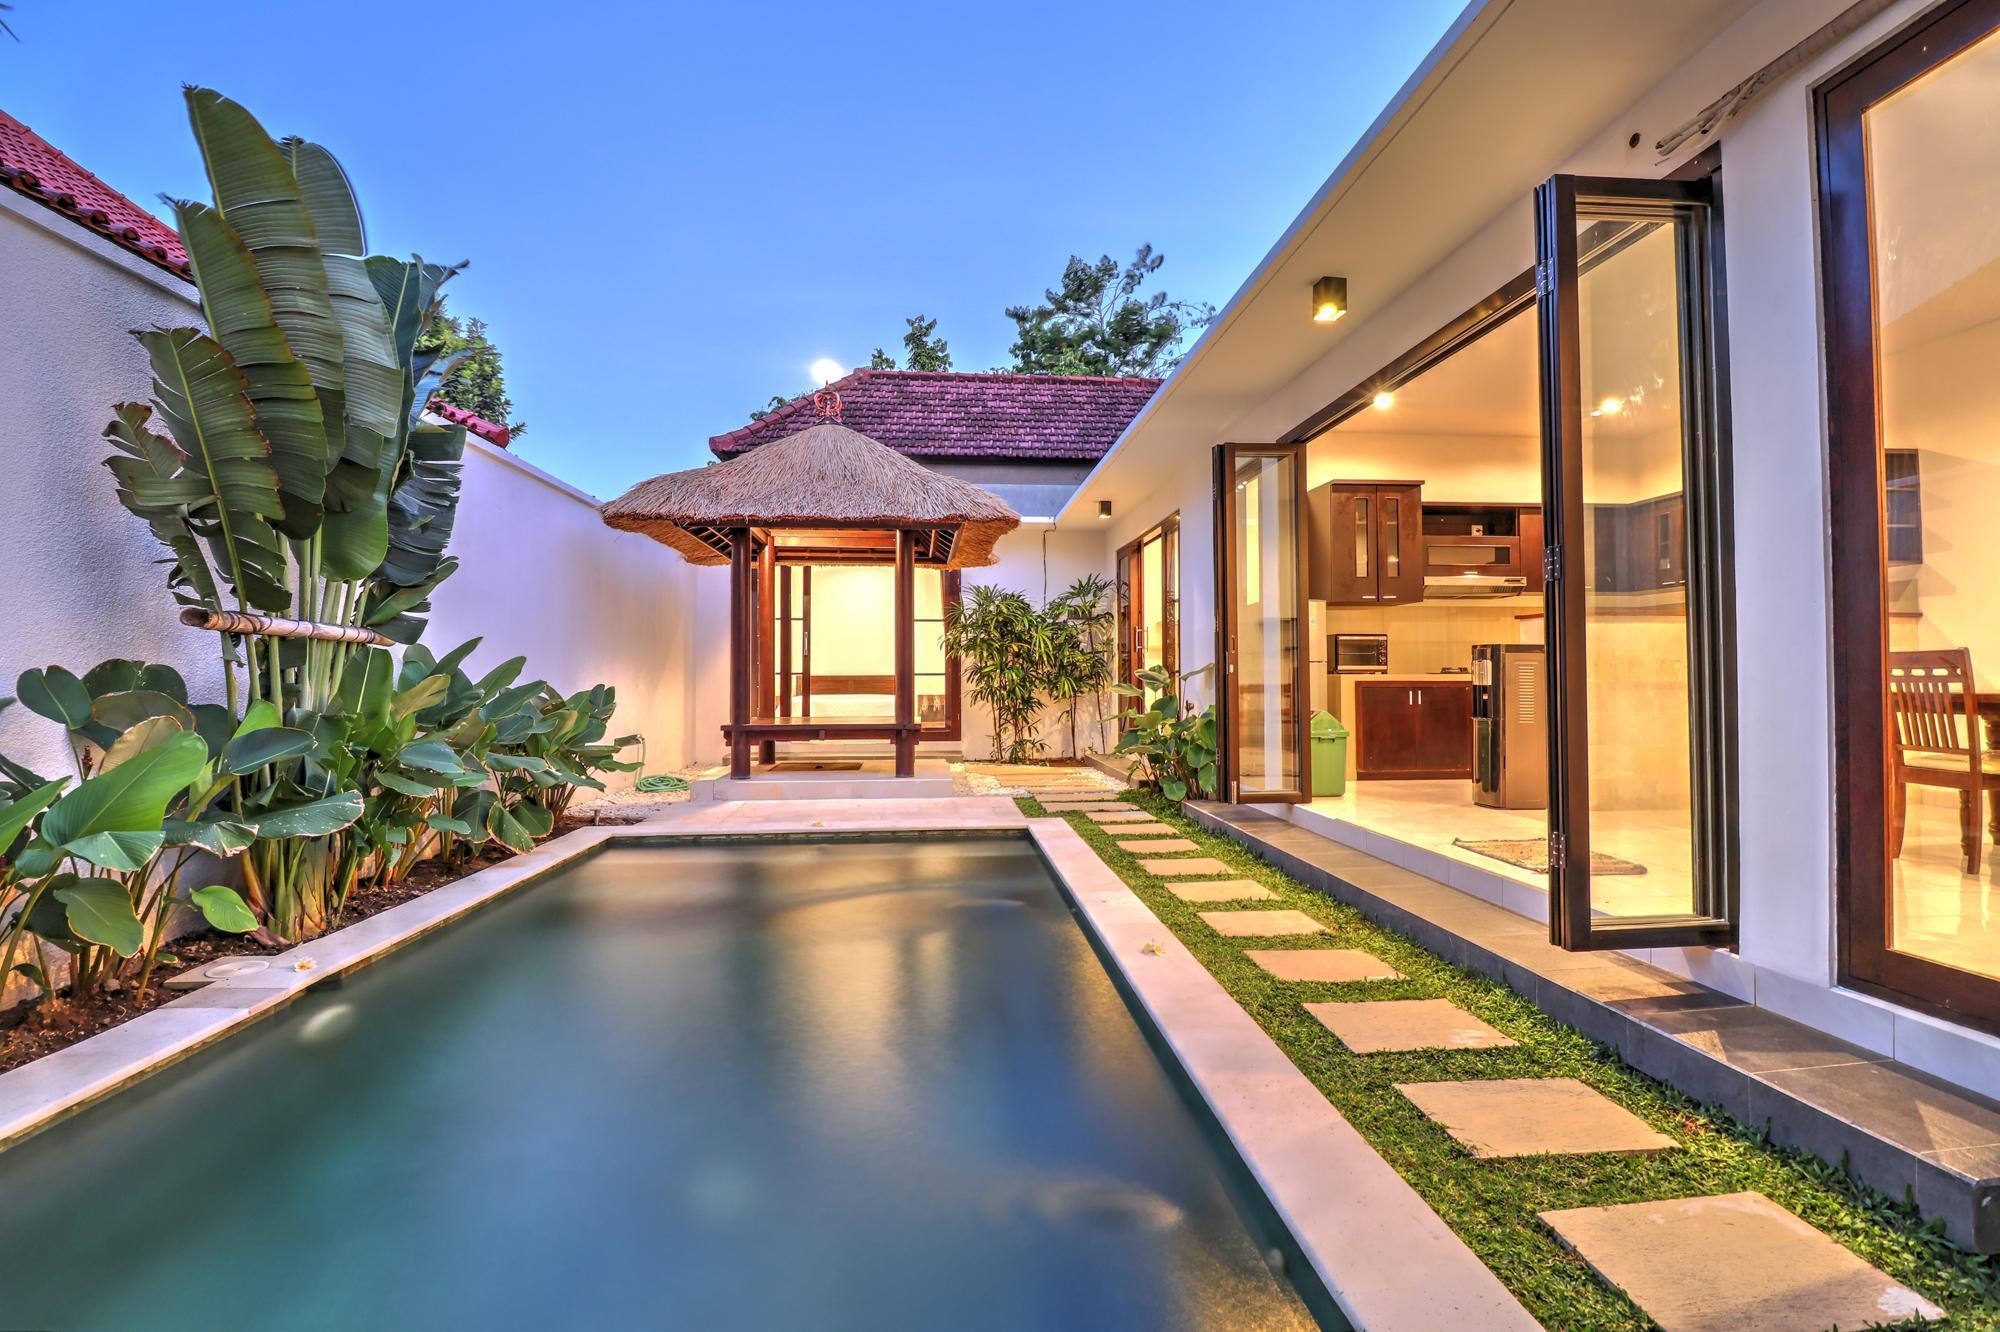 Villa Clover 3br Sanur With Private Pool Entire Villa Bali Deals Photos Reviews